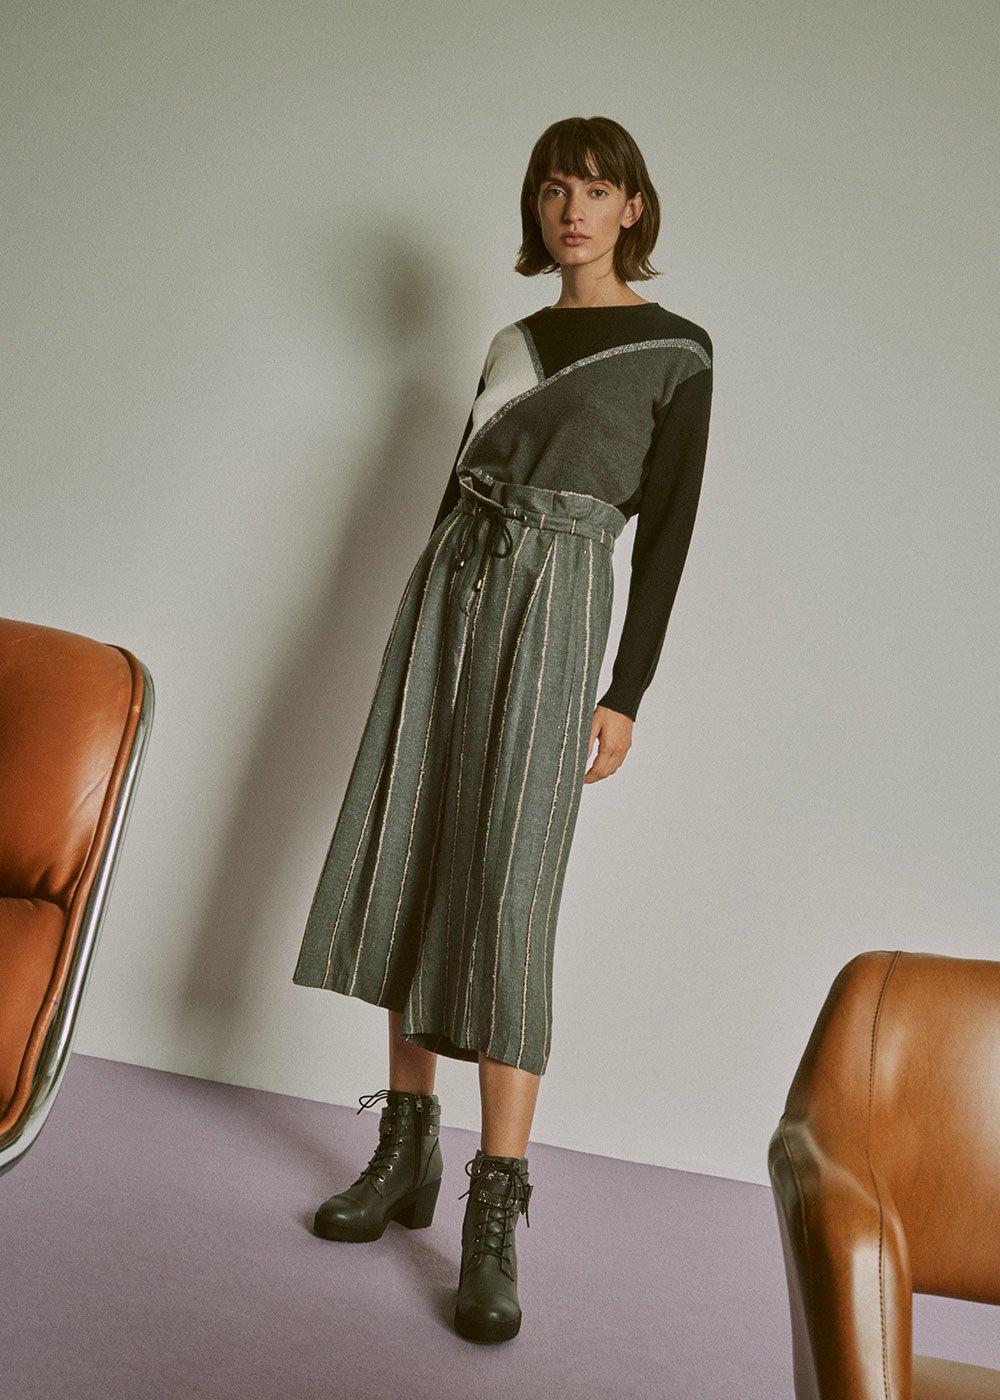 Primo short leg trousers - Grey Melange \L. Beige Stripes - Woman